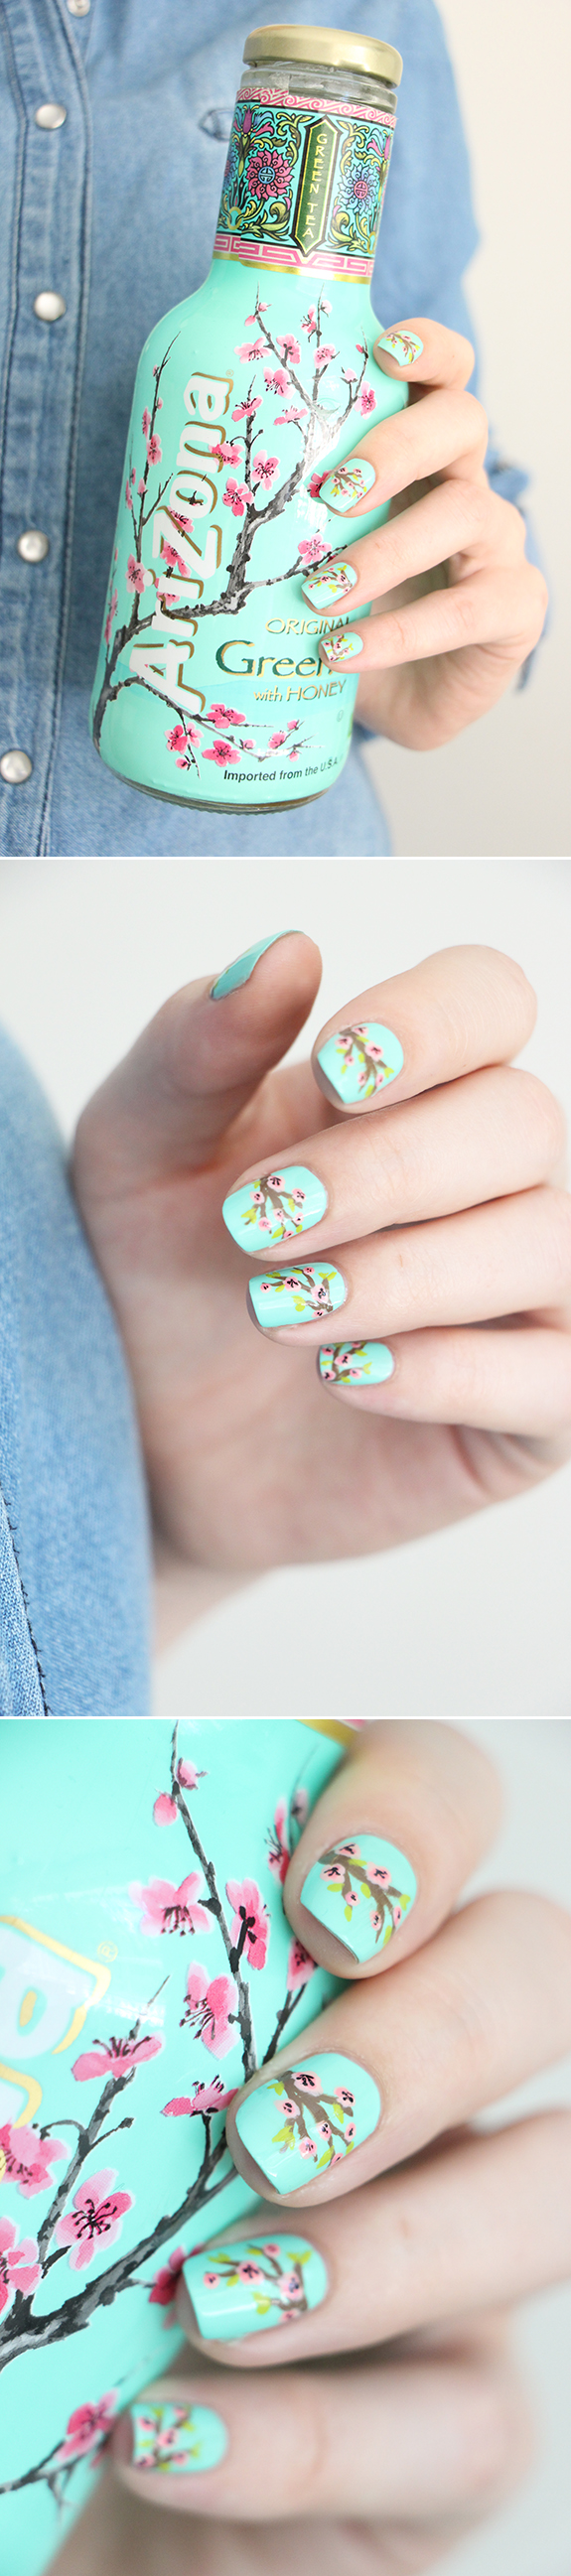 blossom-nails-2